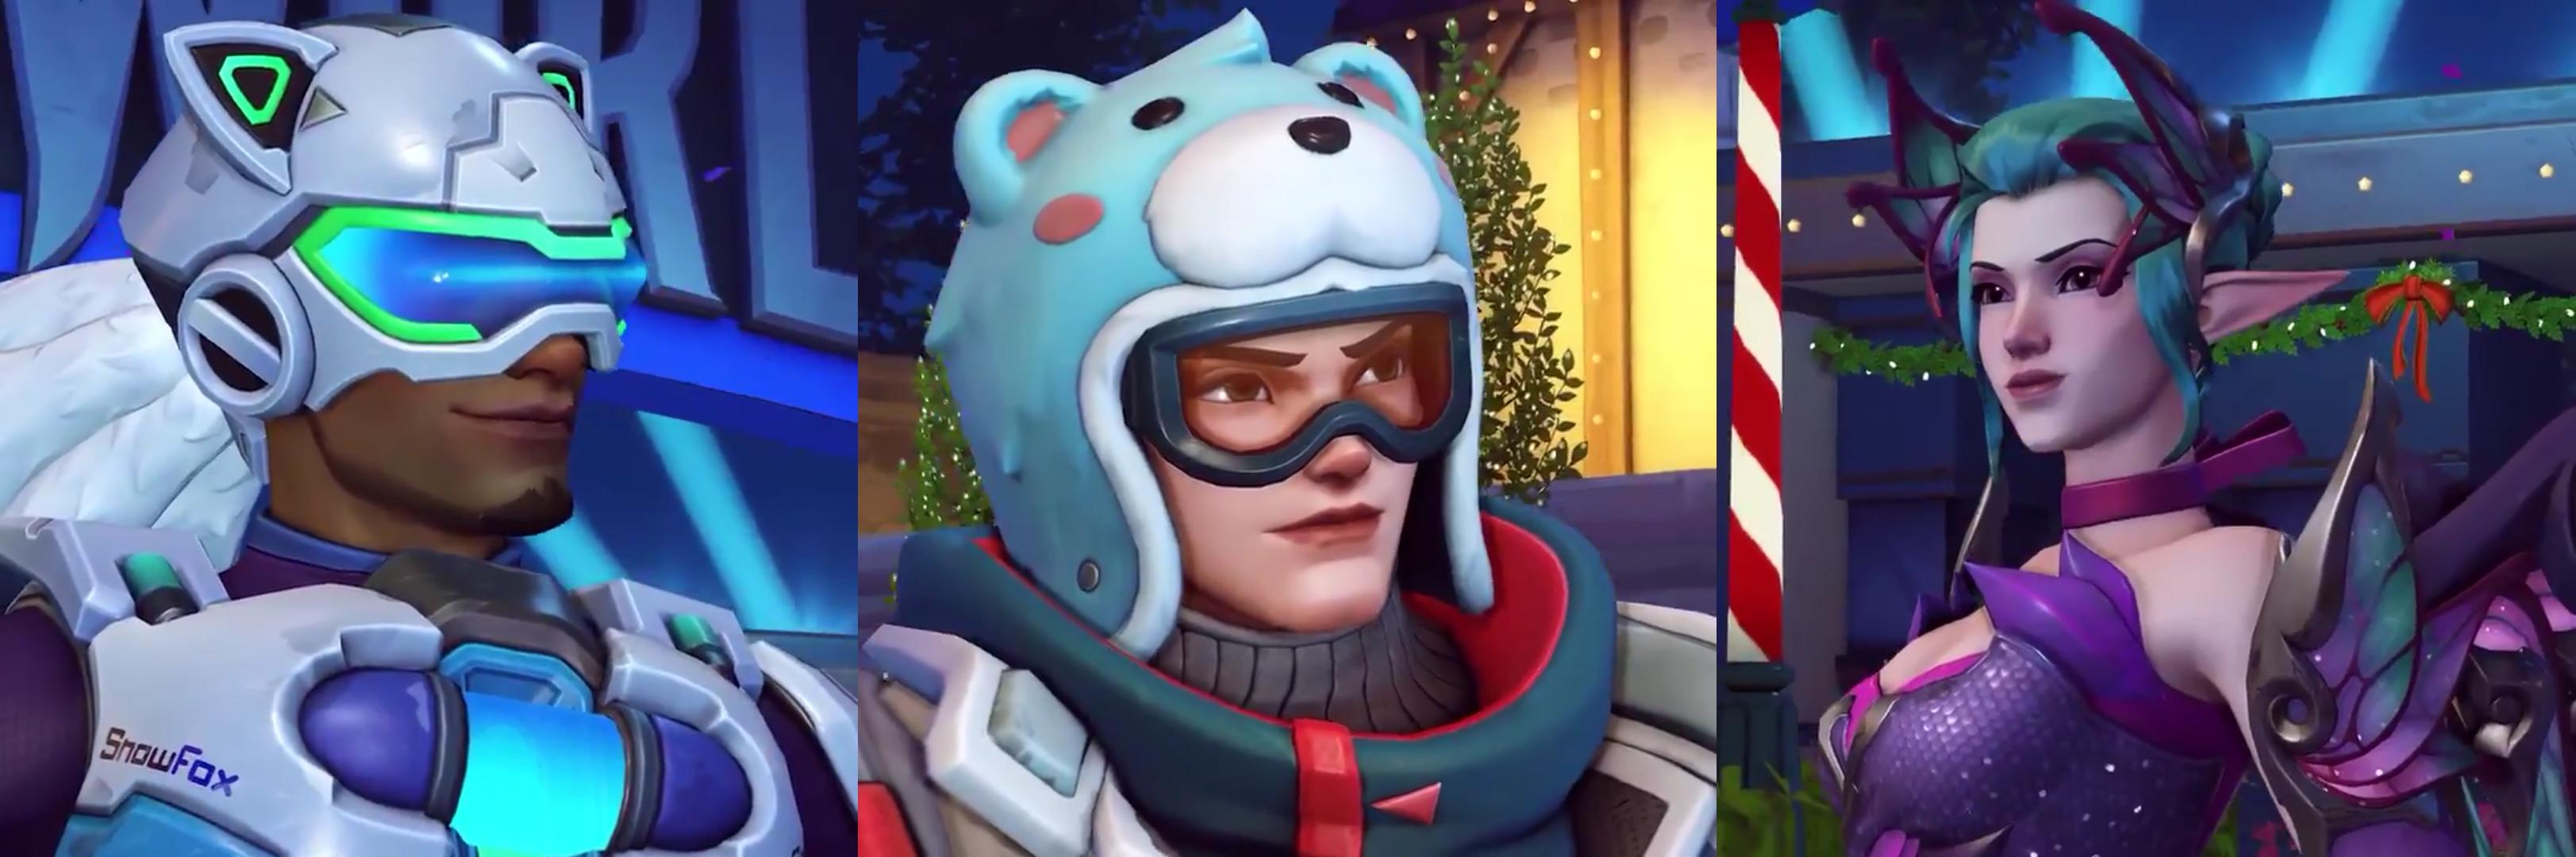 Overwatch shows off its Winter Wonderland skins screenshot